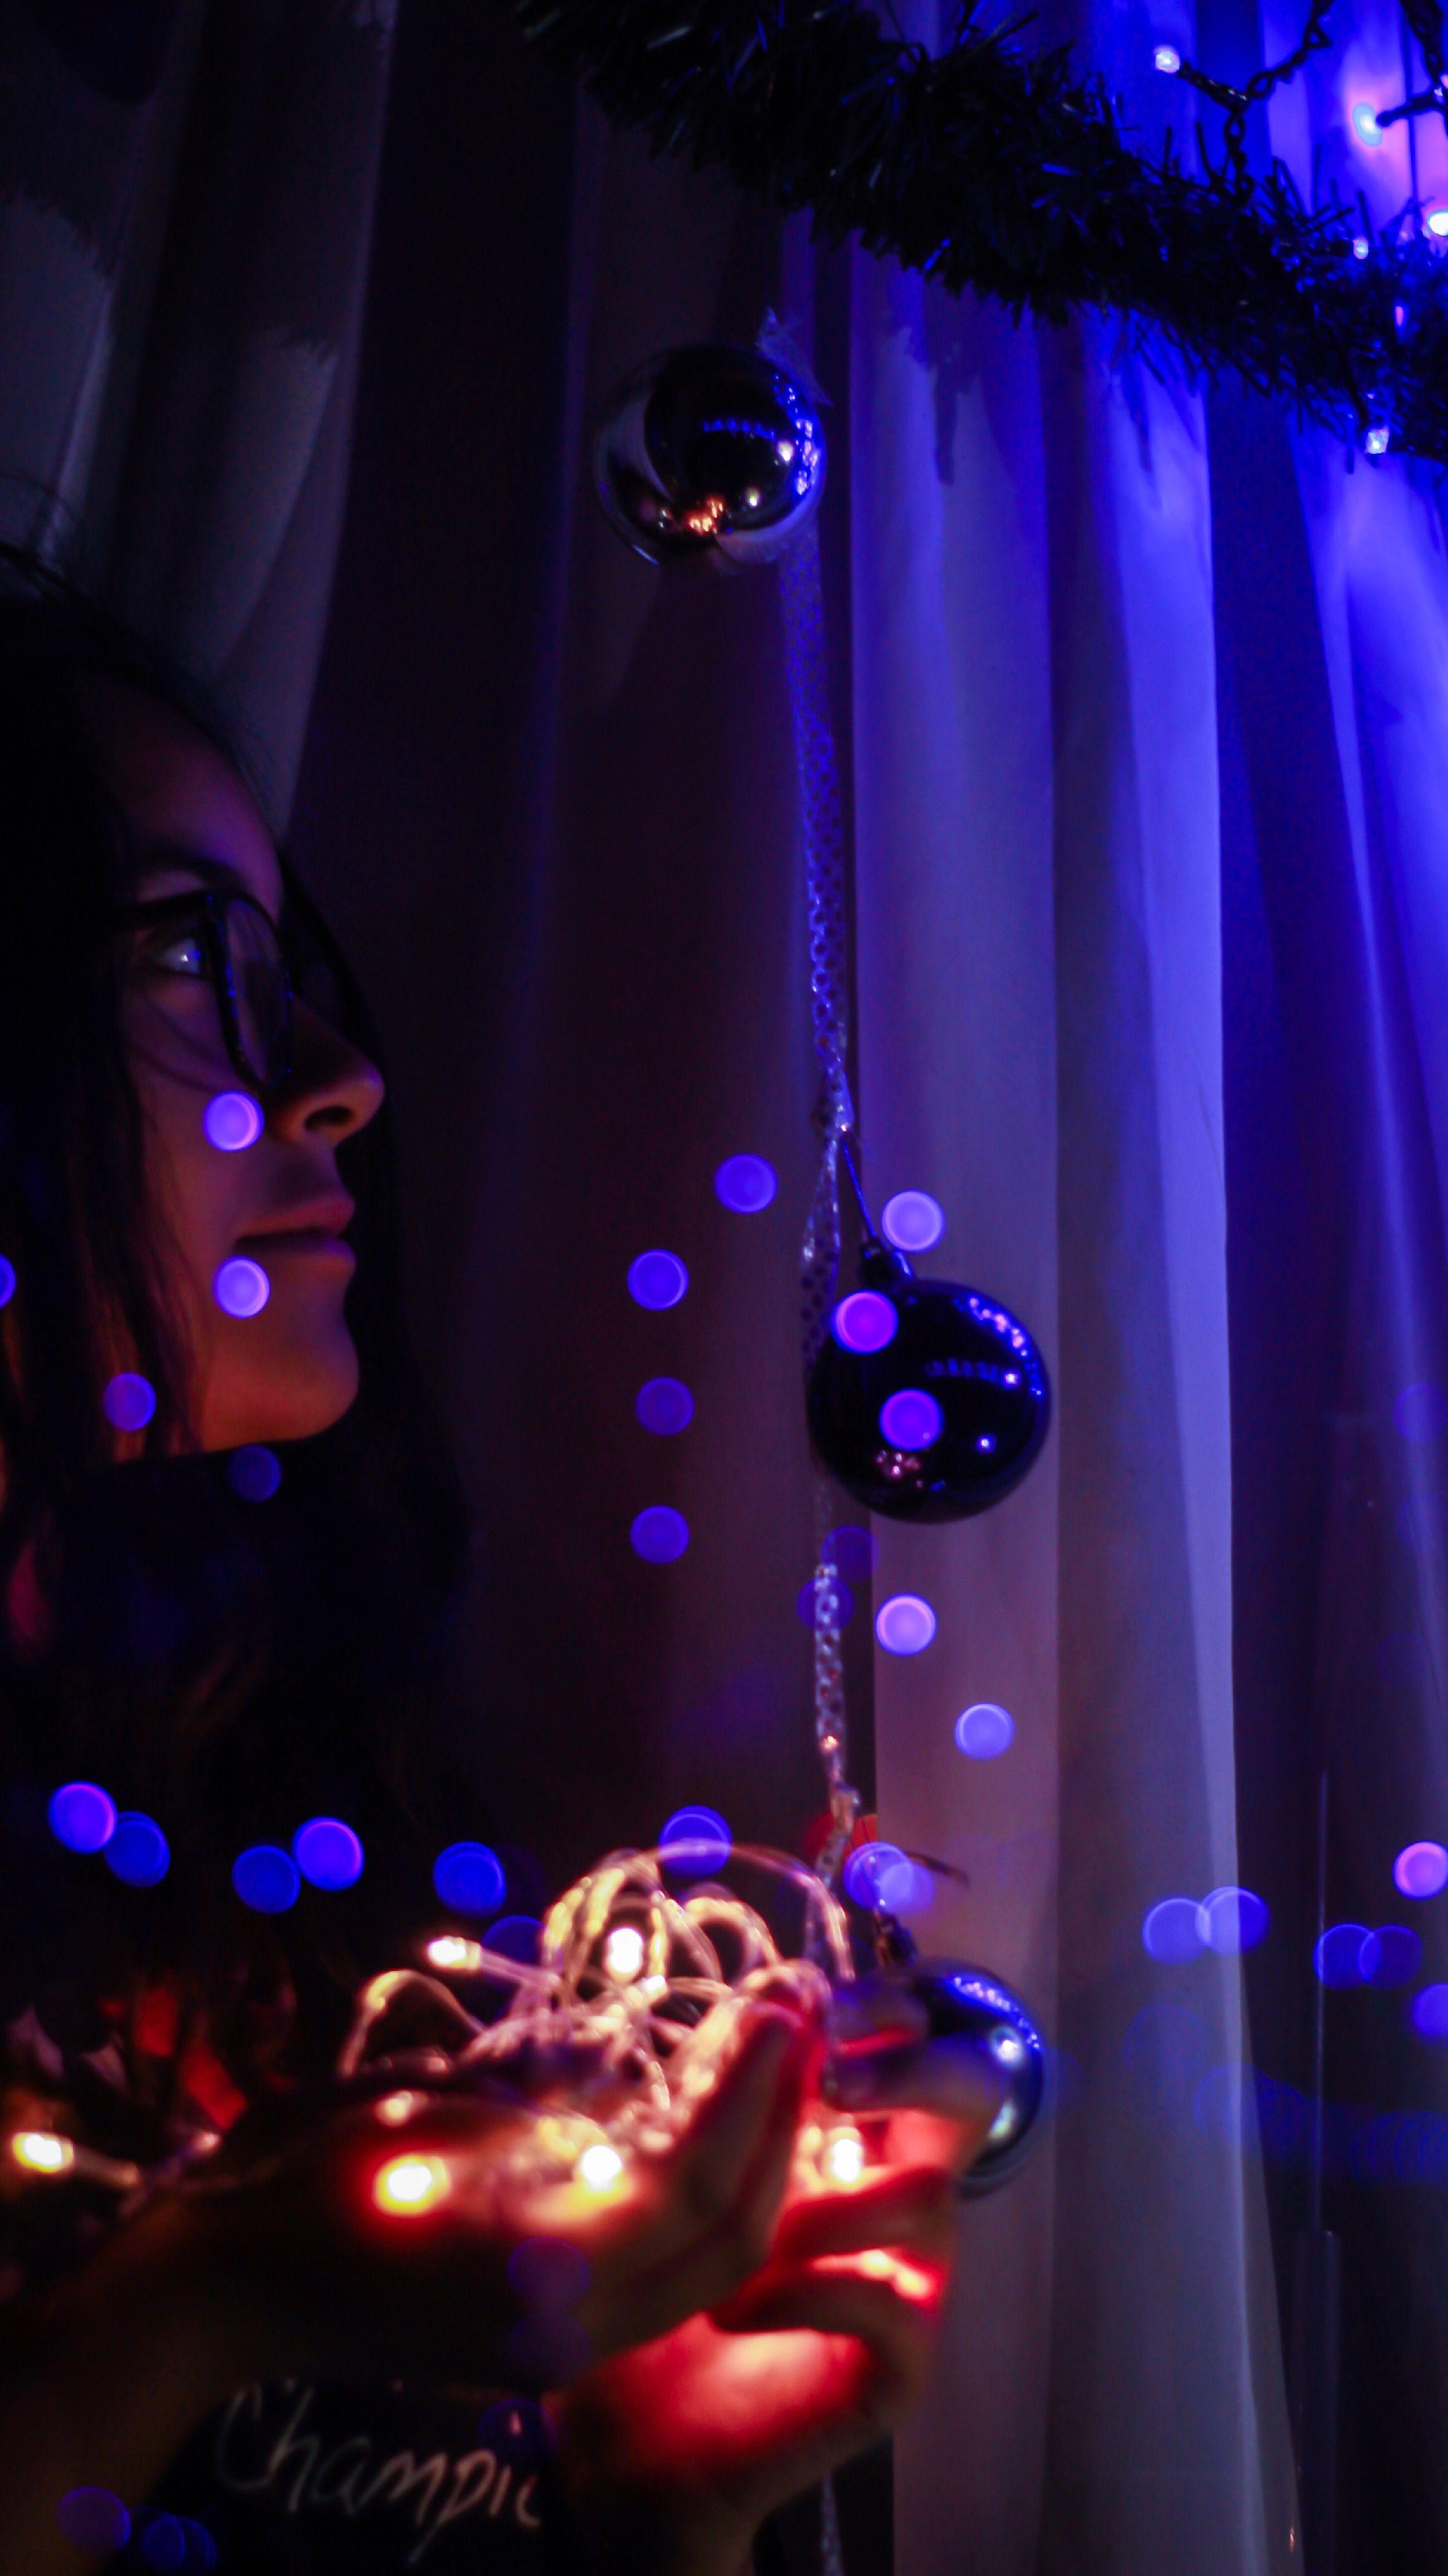 Christmas Photoshoot Lights Love Photography